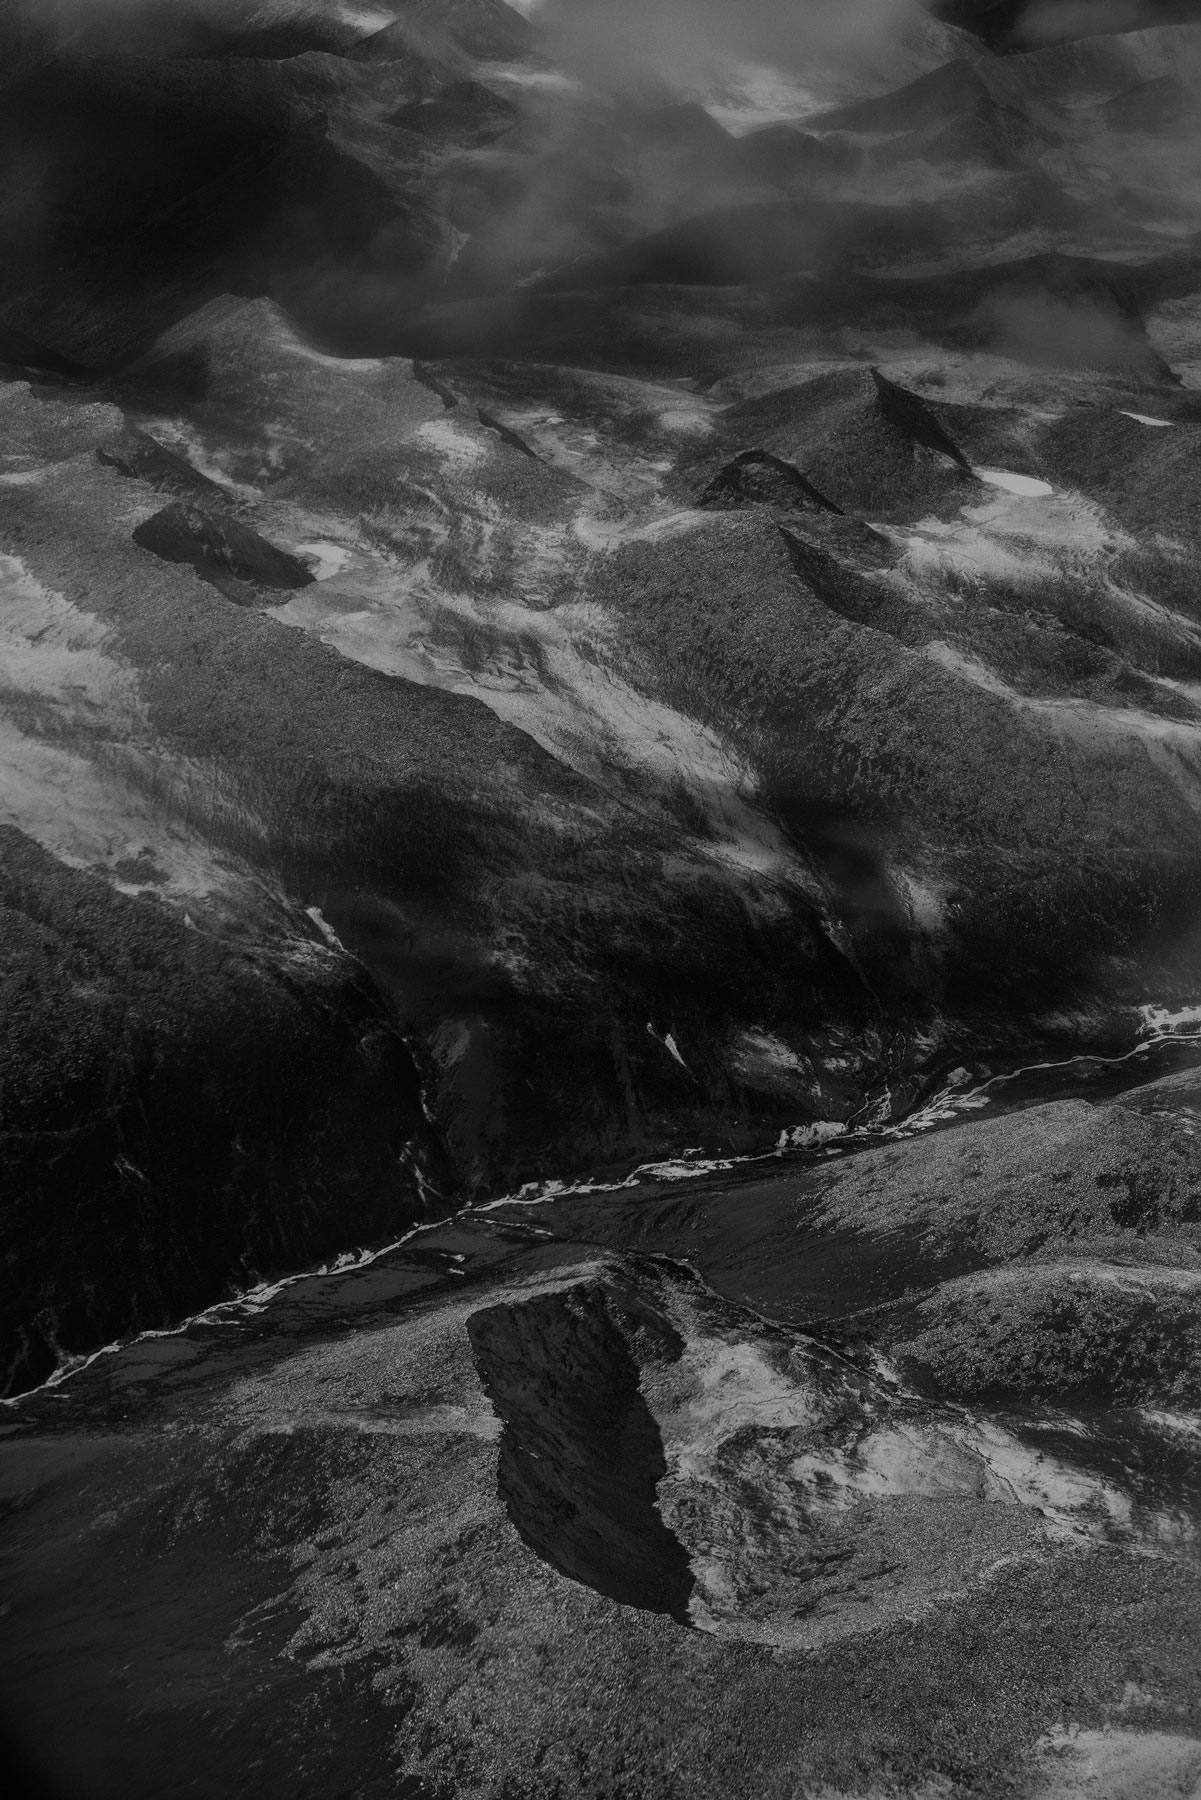 mountain-path-middle-nowhere.jpg